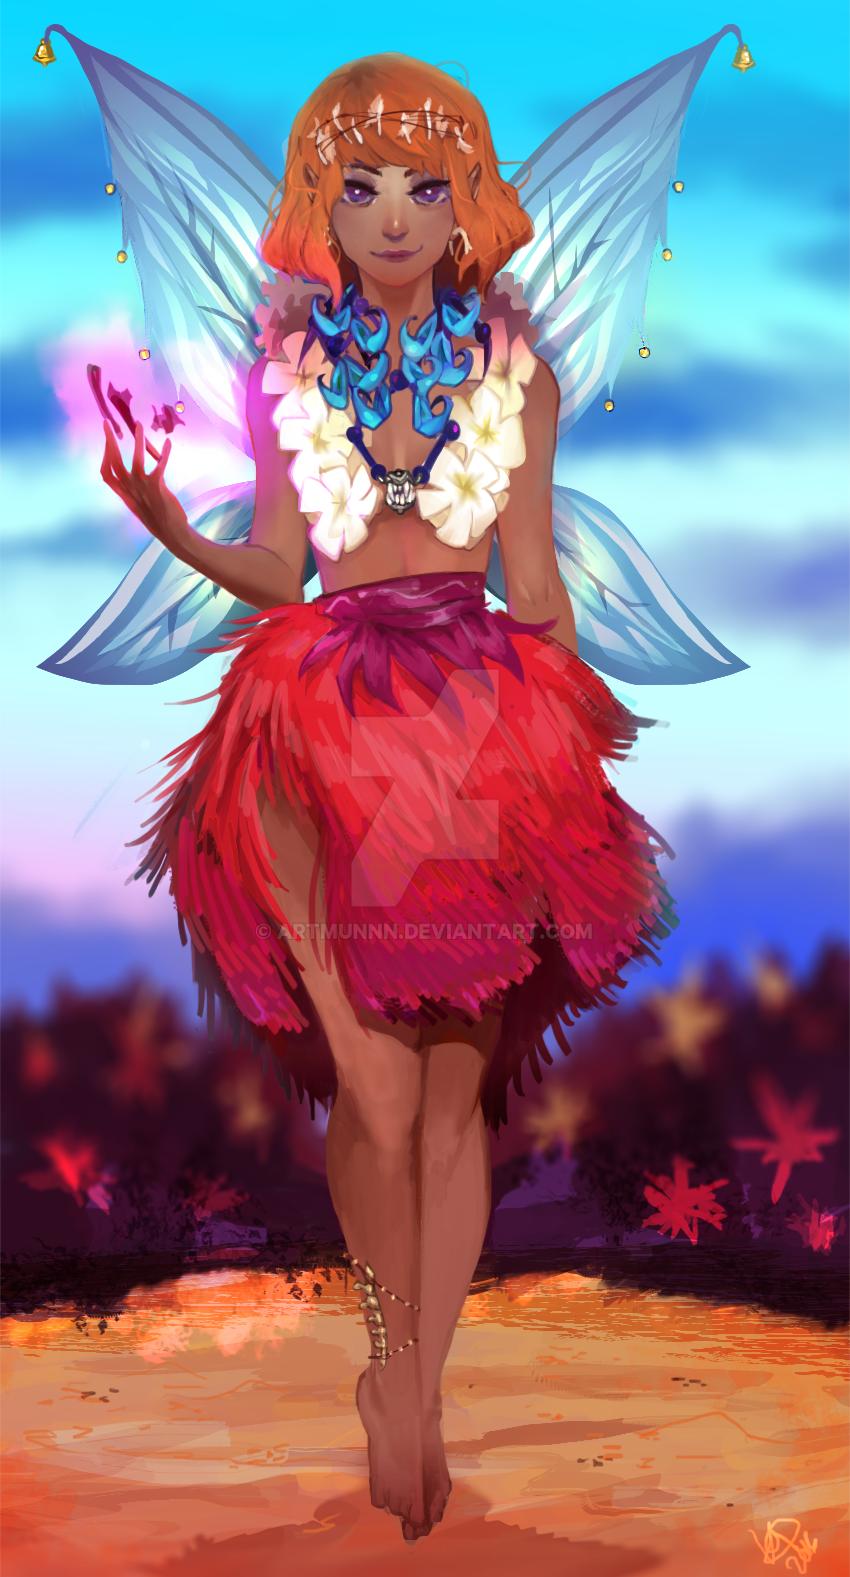 Mimosa by artmunnn